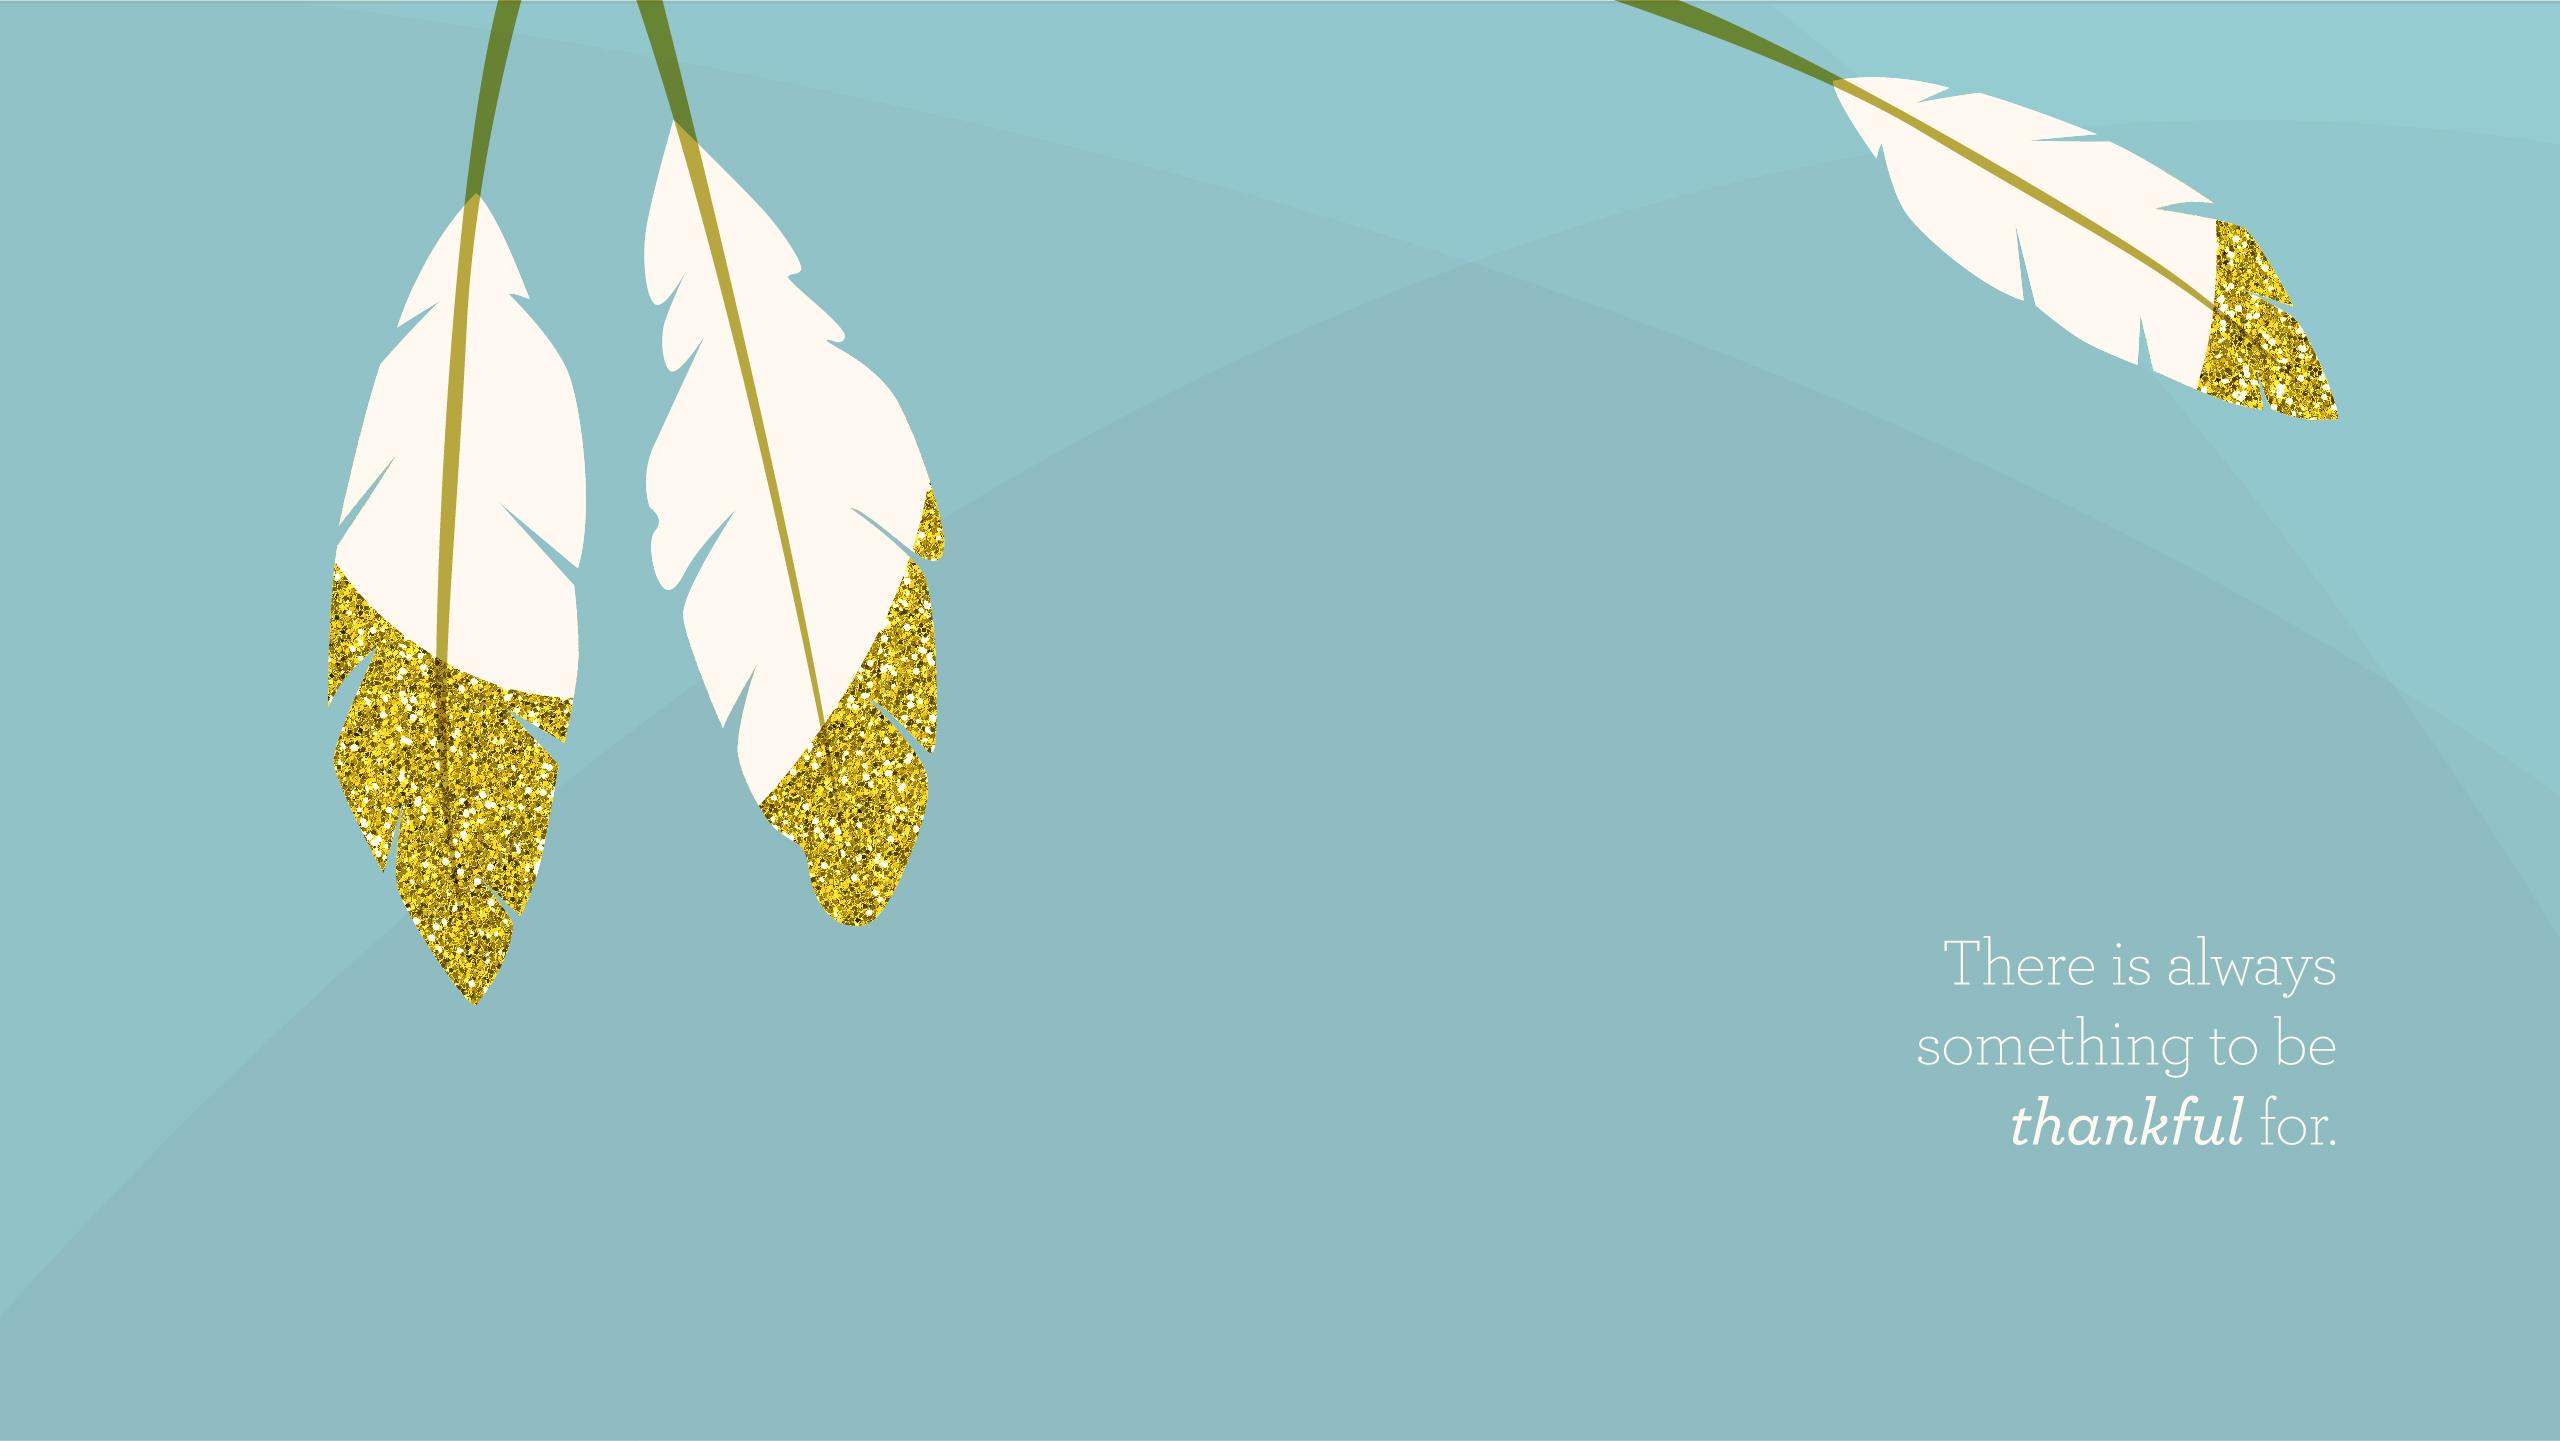 Home Fall Desktop Wallpapers For Macbook Air November Wallpapers Hd Free Download Pixelstalk Net